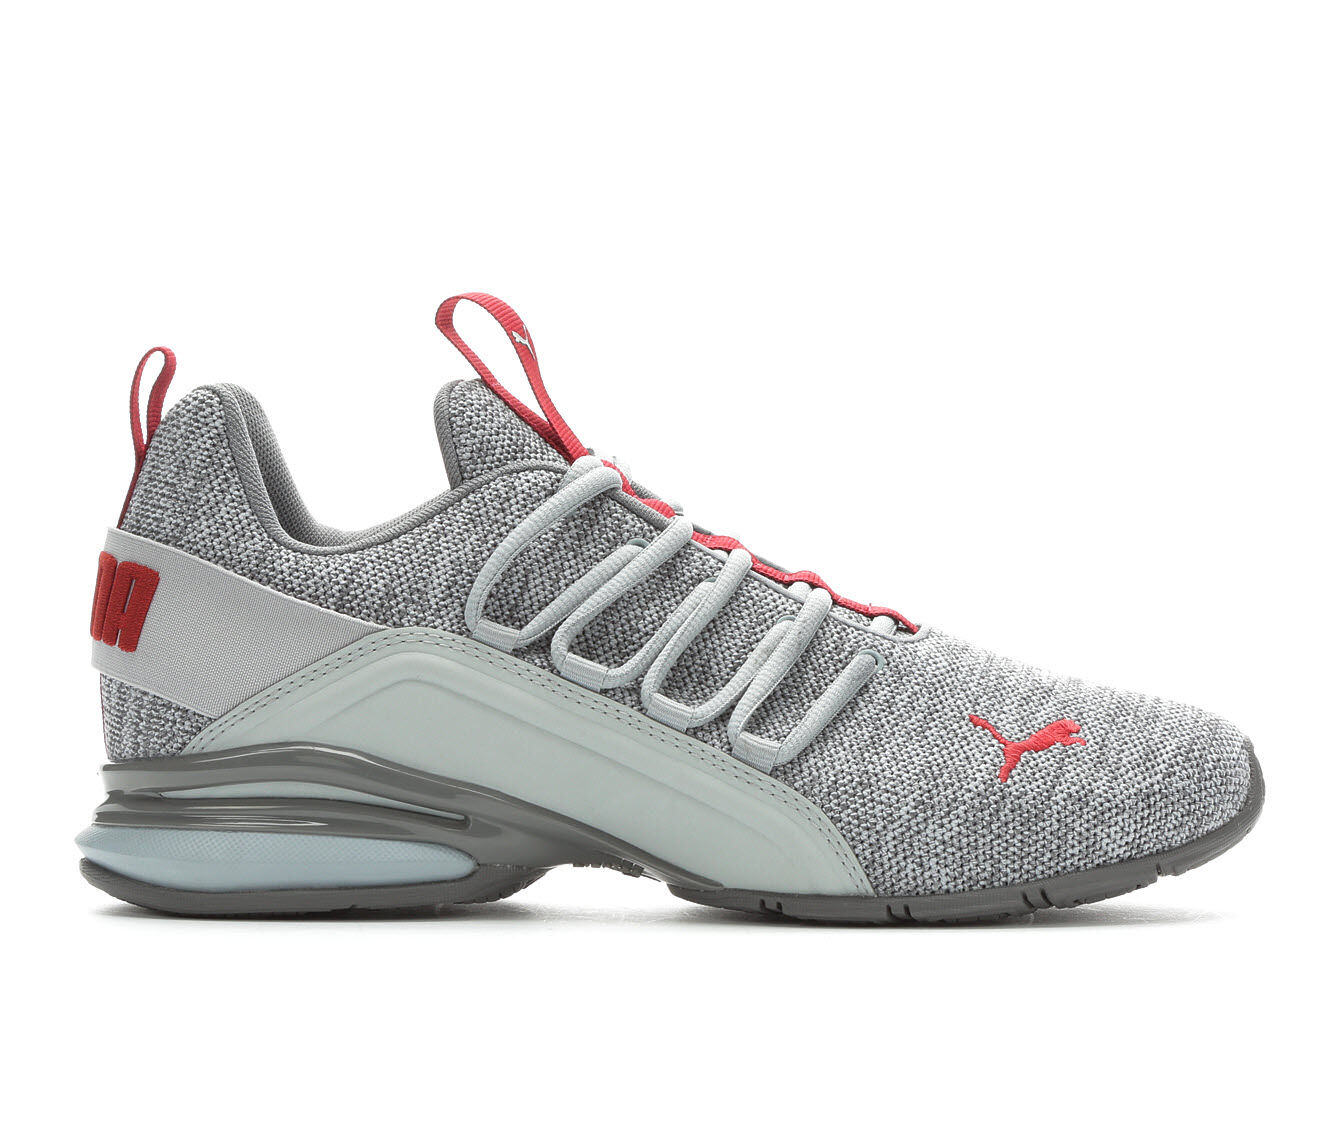 Men's Puma Axelion Knit Sneakers Grey/Burgundy